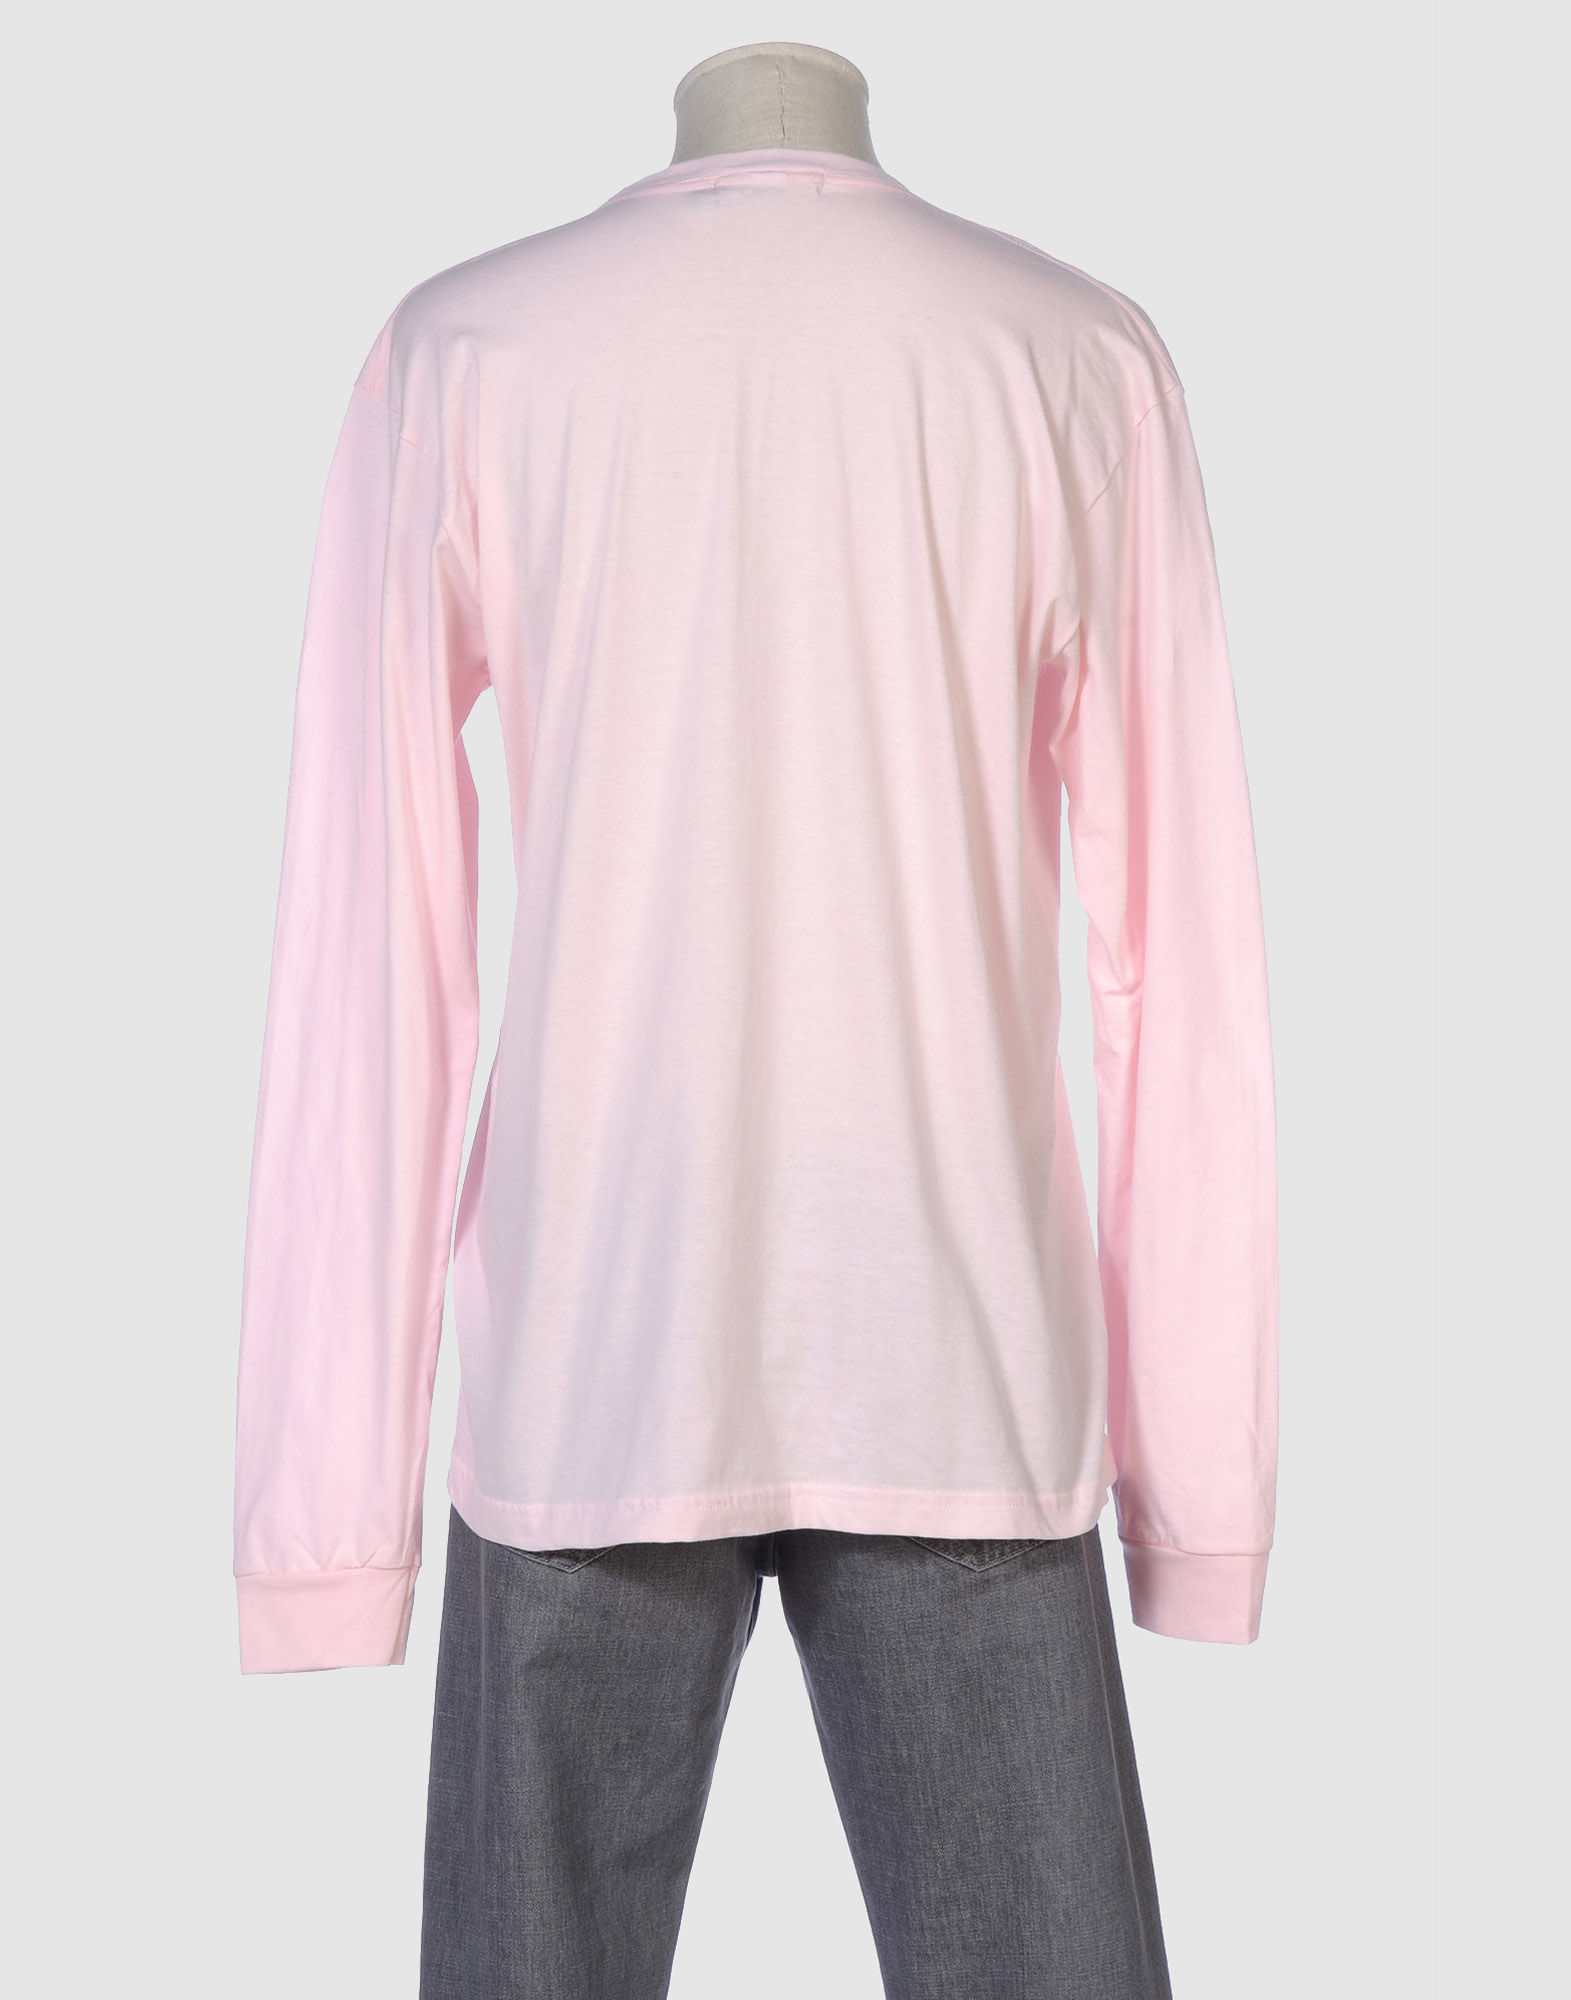 Libertine long sleeve t shirt in pink for men lyst for Mens pink long sleeve shirt